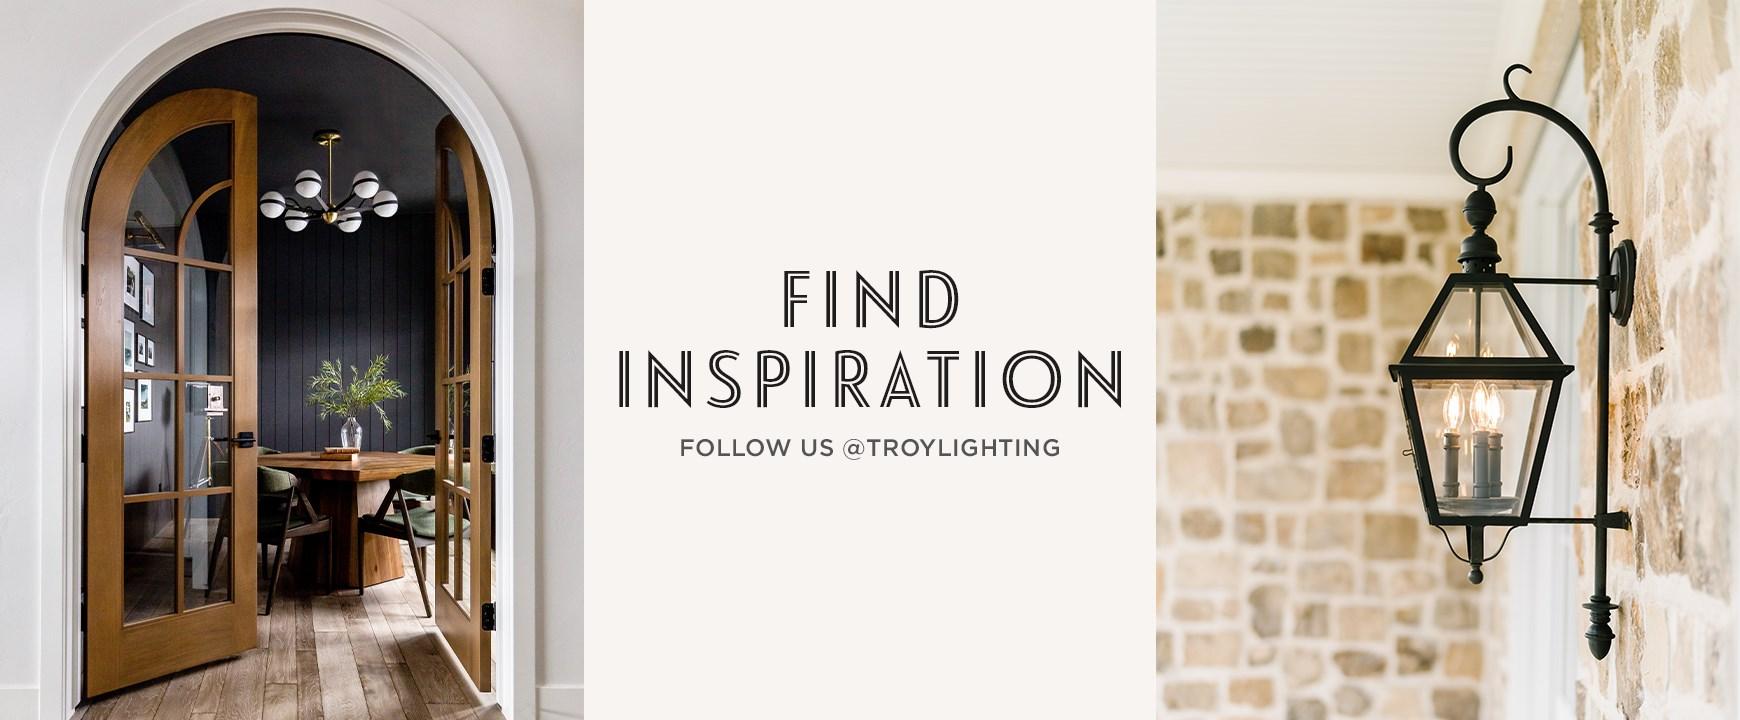 follow us @troylighting